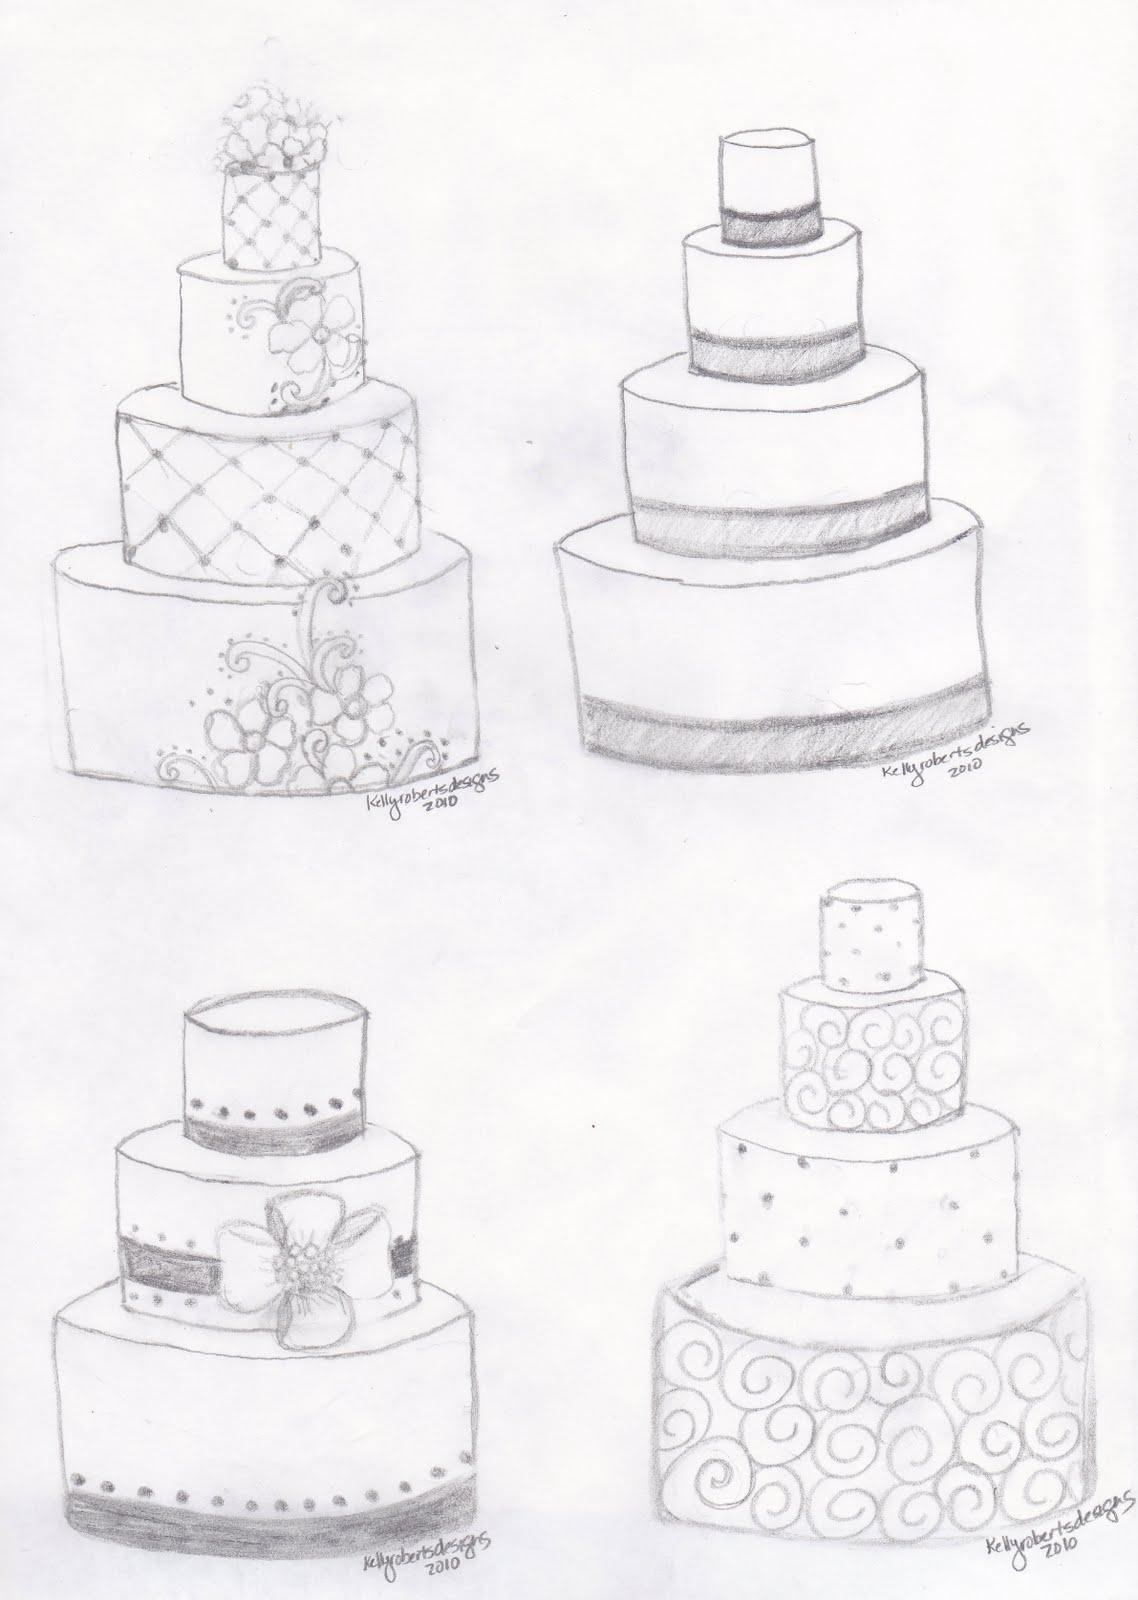 Kelly Roberts Designs: Wedding or Celebration Cake Design ...